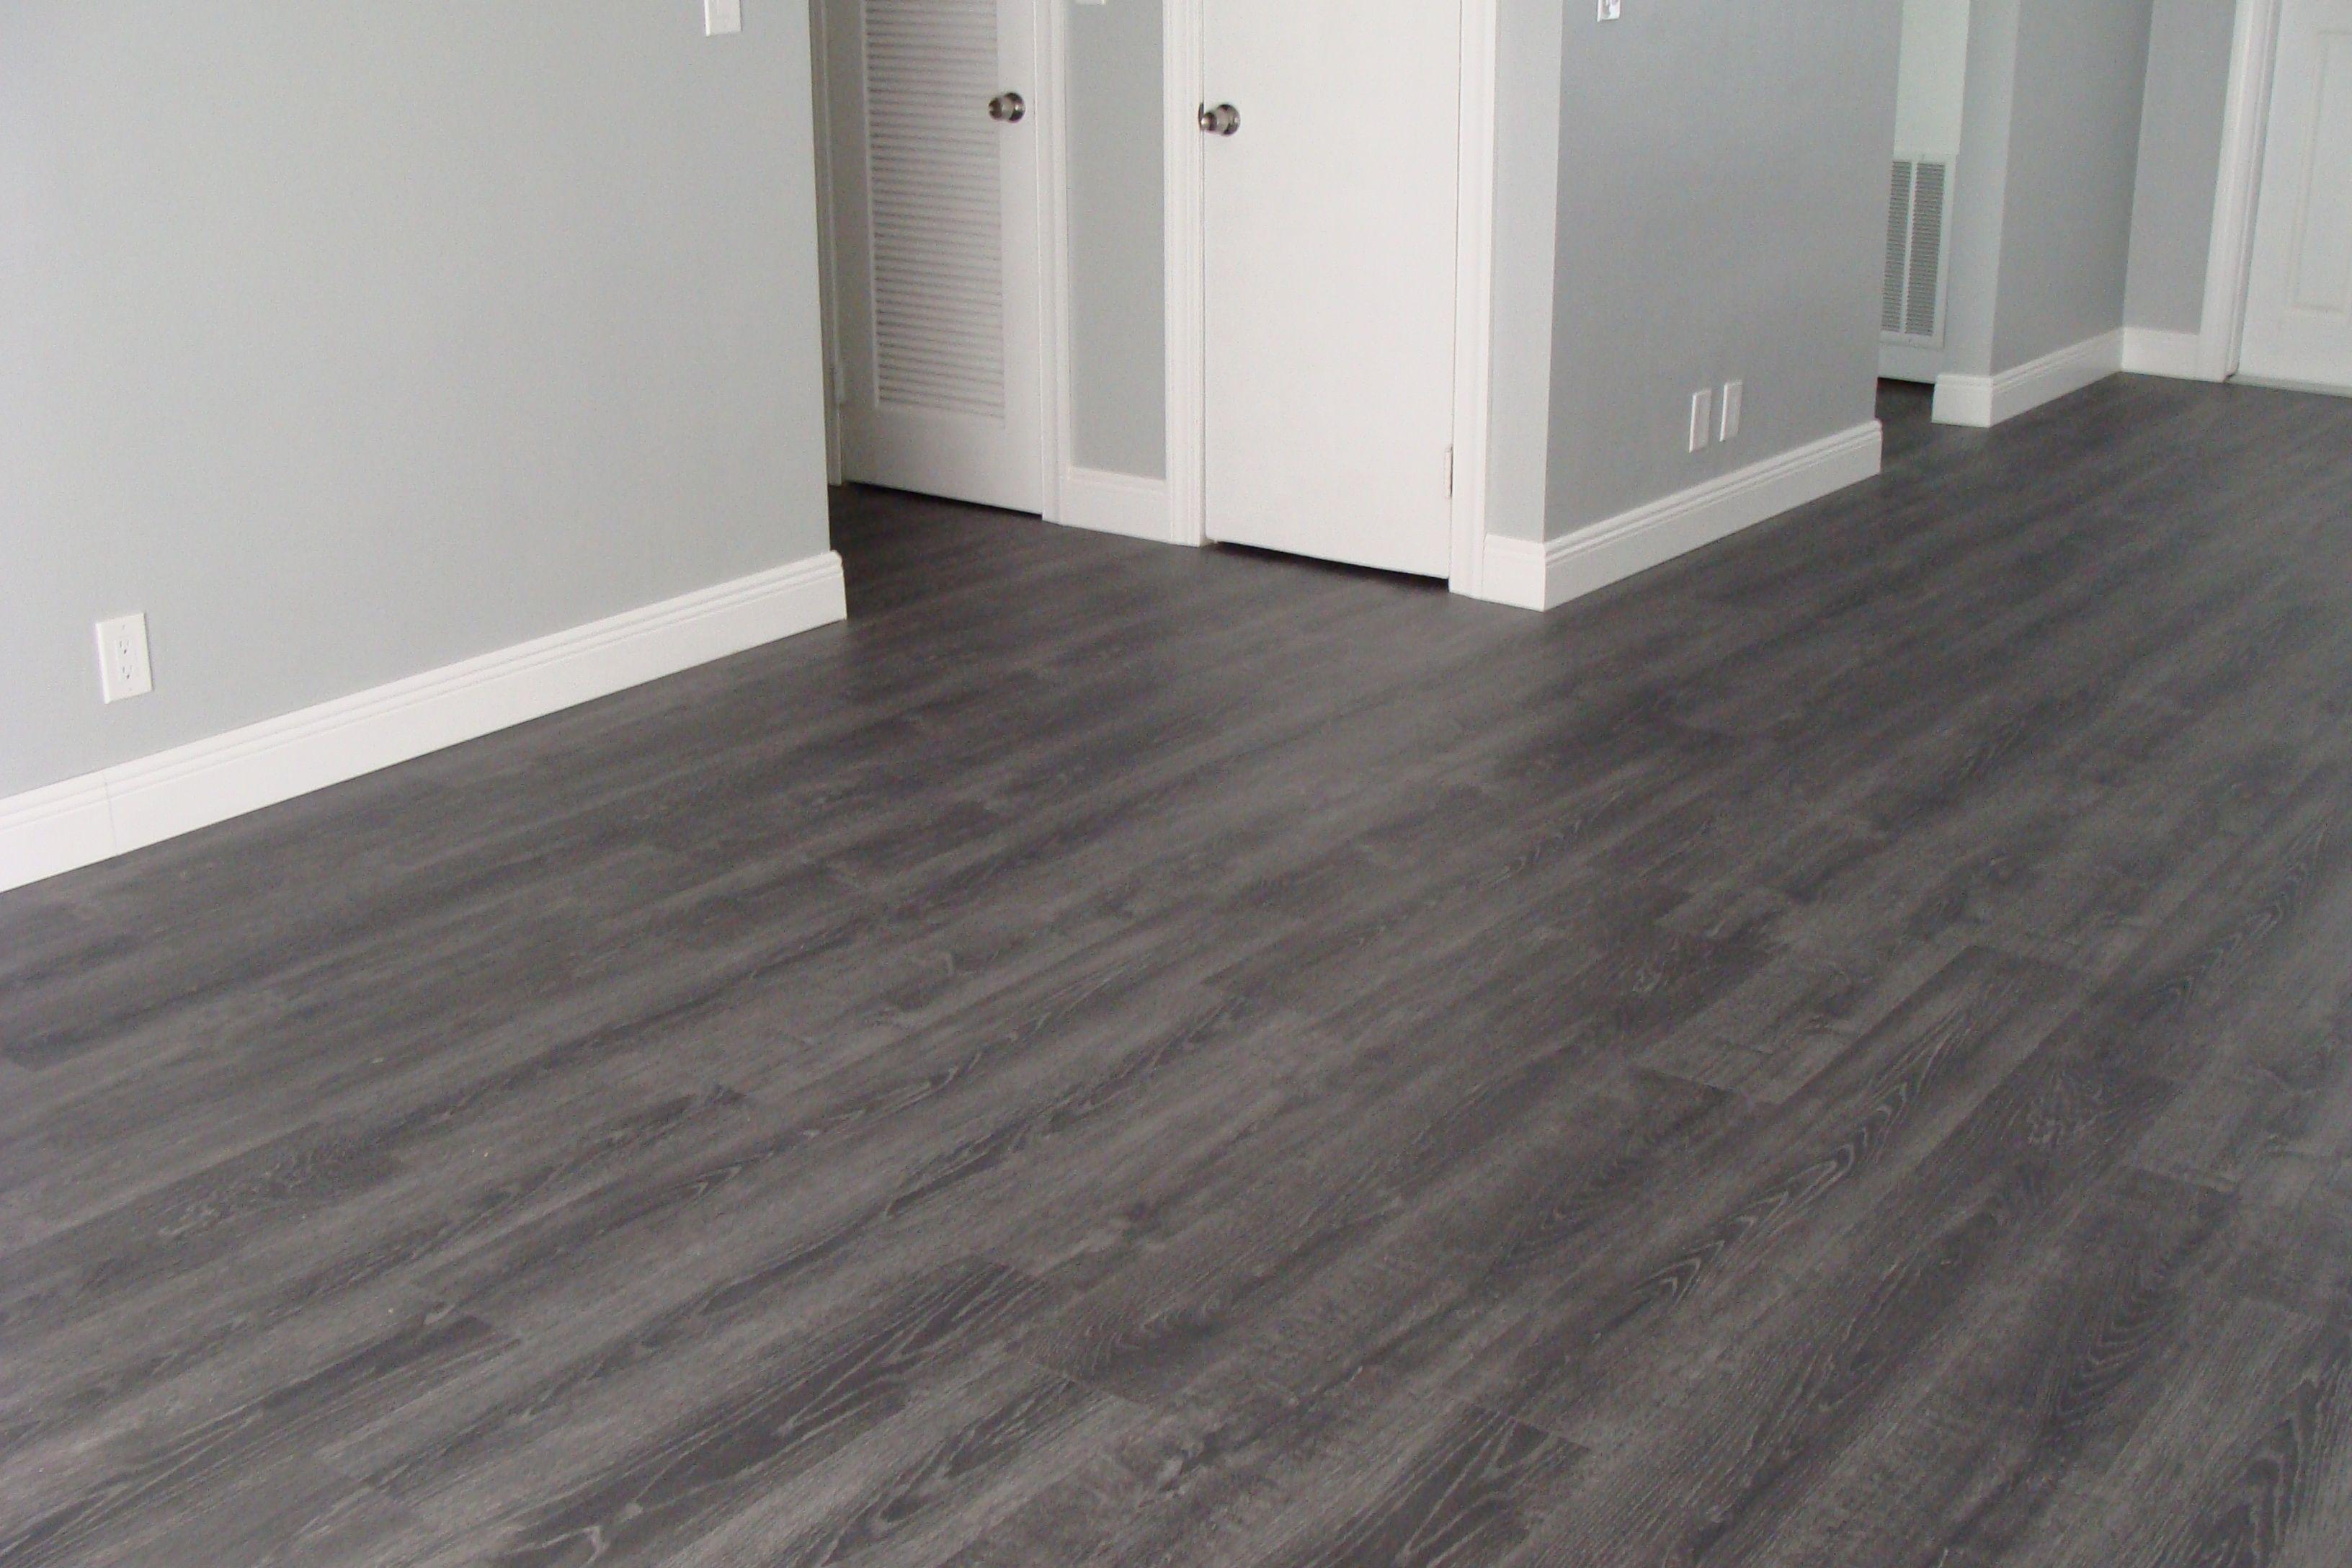 Grey laminate wood flooring tokyo oak grey laminate all rooms minus the bathrooms dark grey laminate CQPMUUG